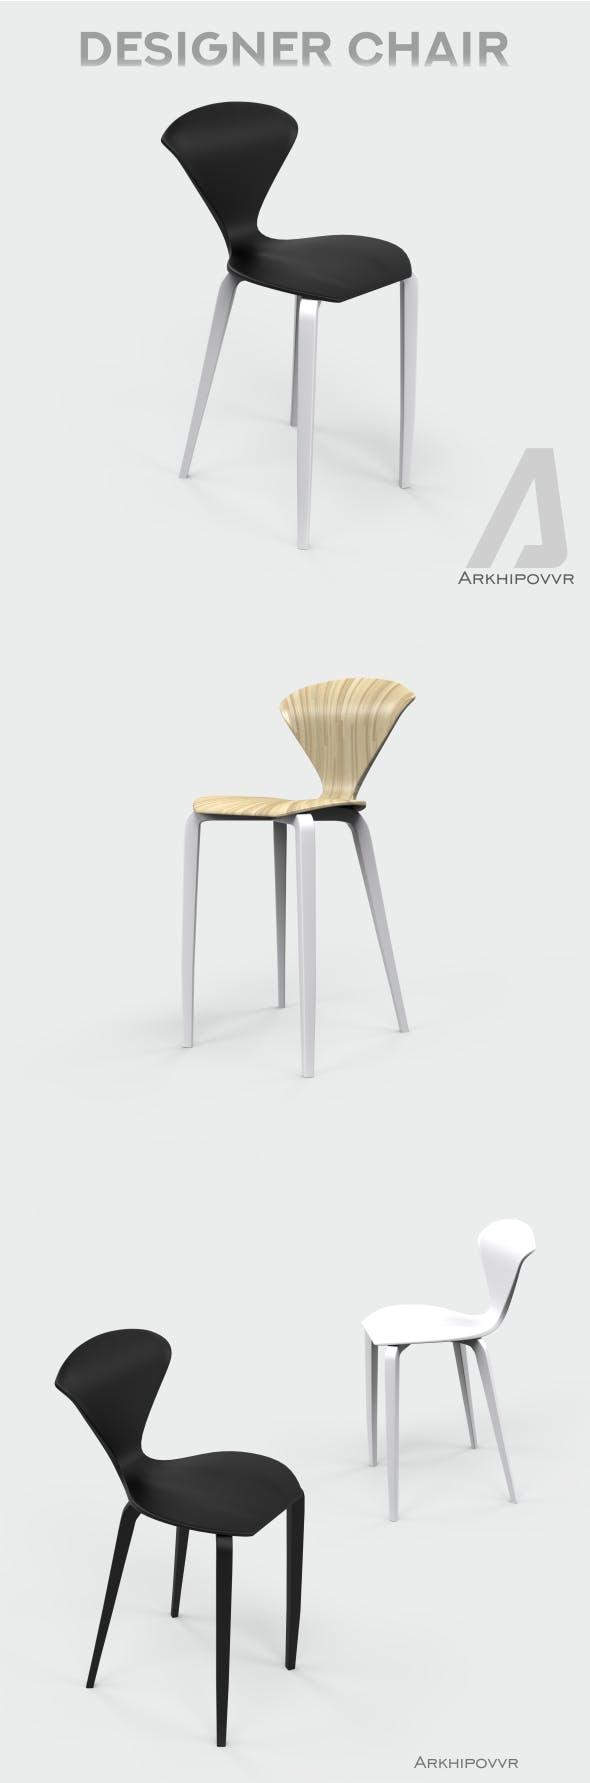 Designer chair - 3DOcean Item for Sale